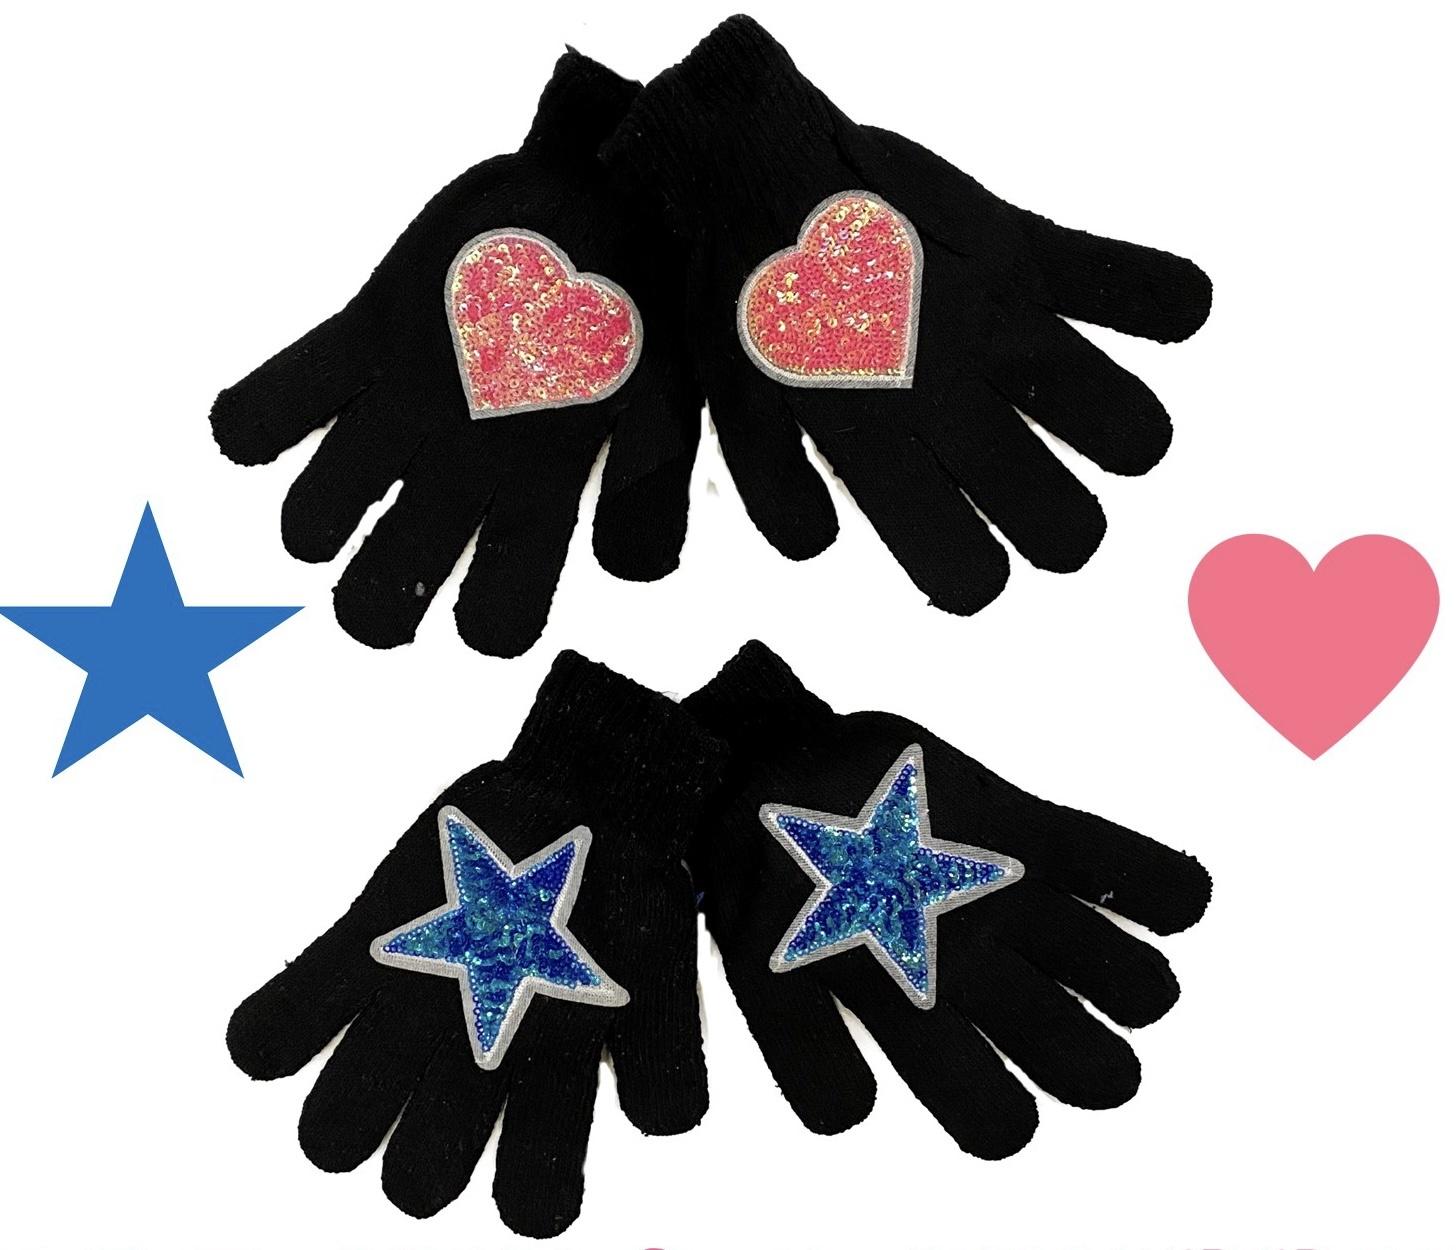 Black Stretch Gloves with Sequin Applique - Kids/Tween